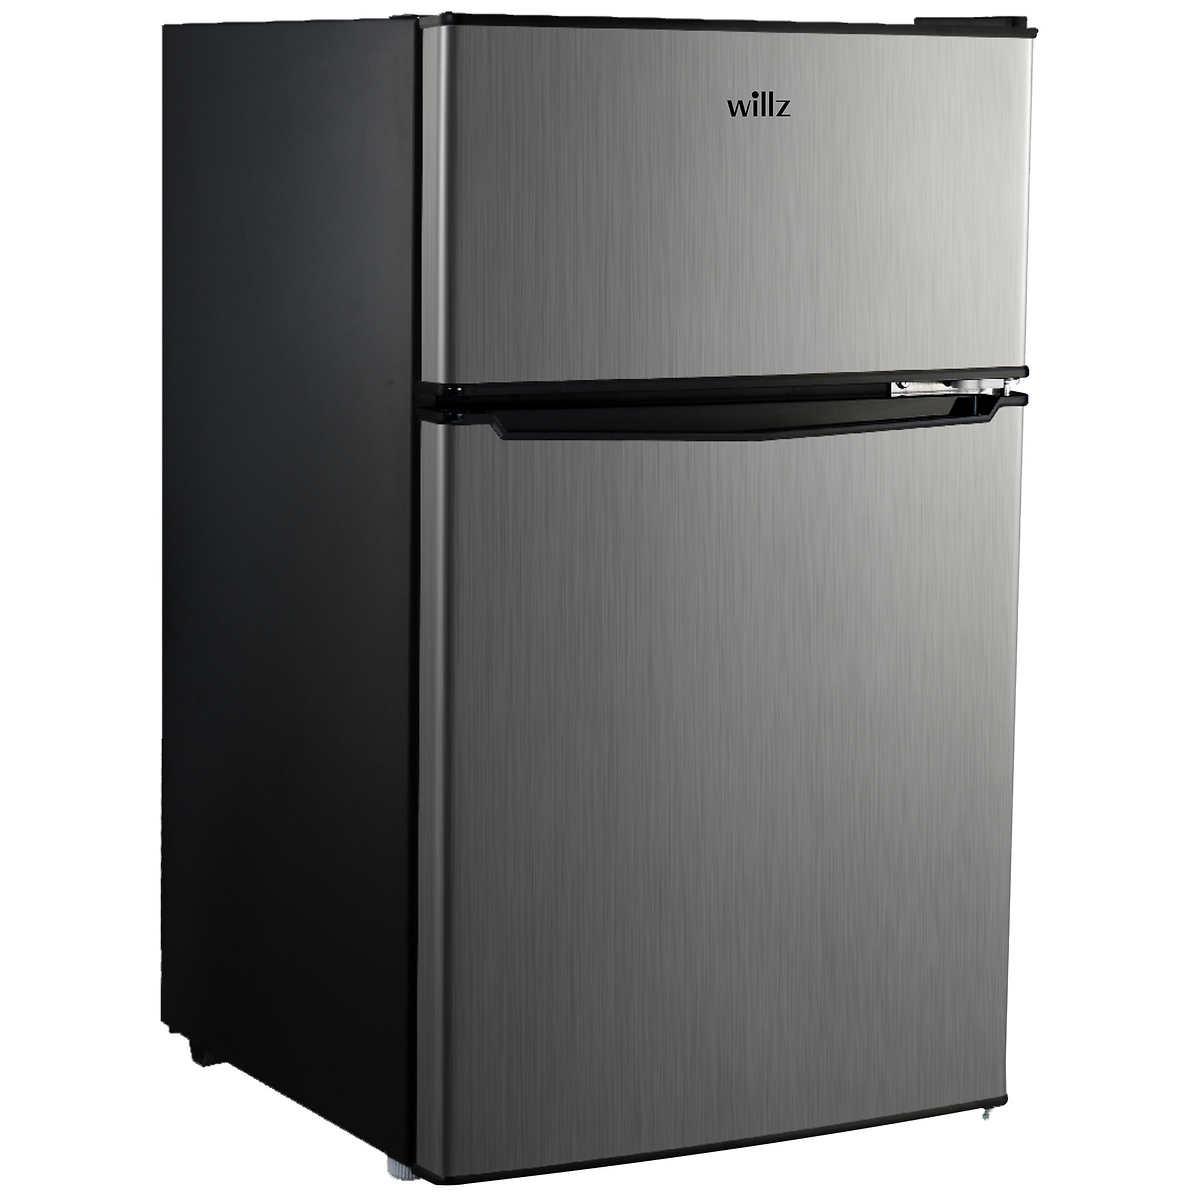 Willz 3 1 cu ft Energy Star Compact Refrigerator WLR31TS1E